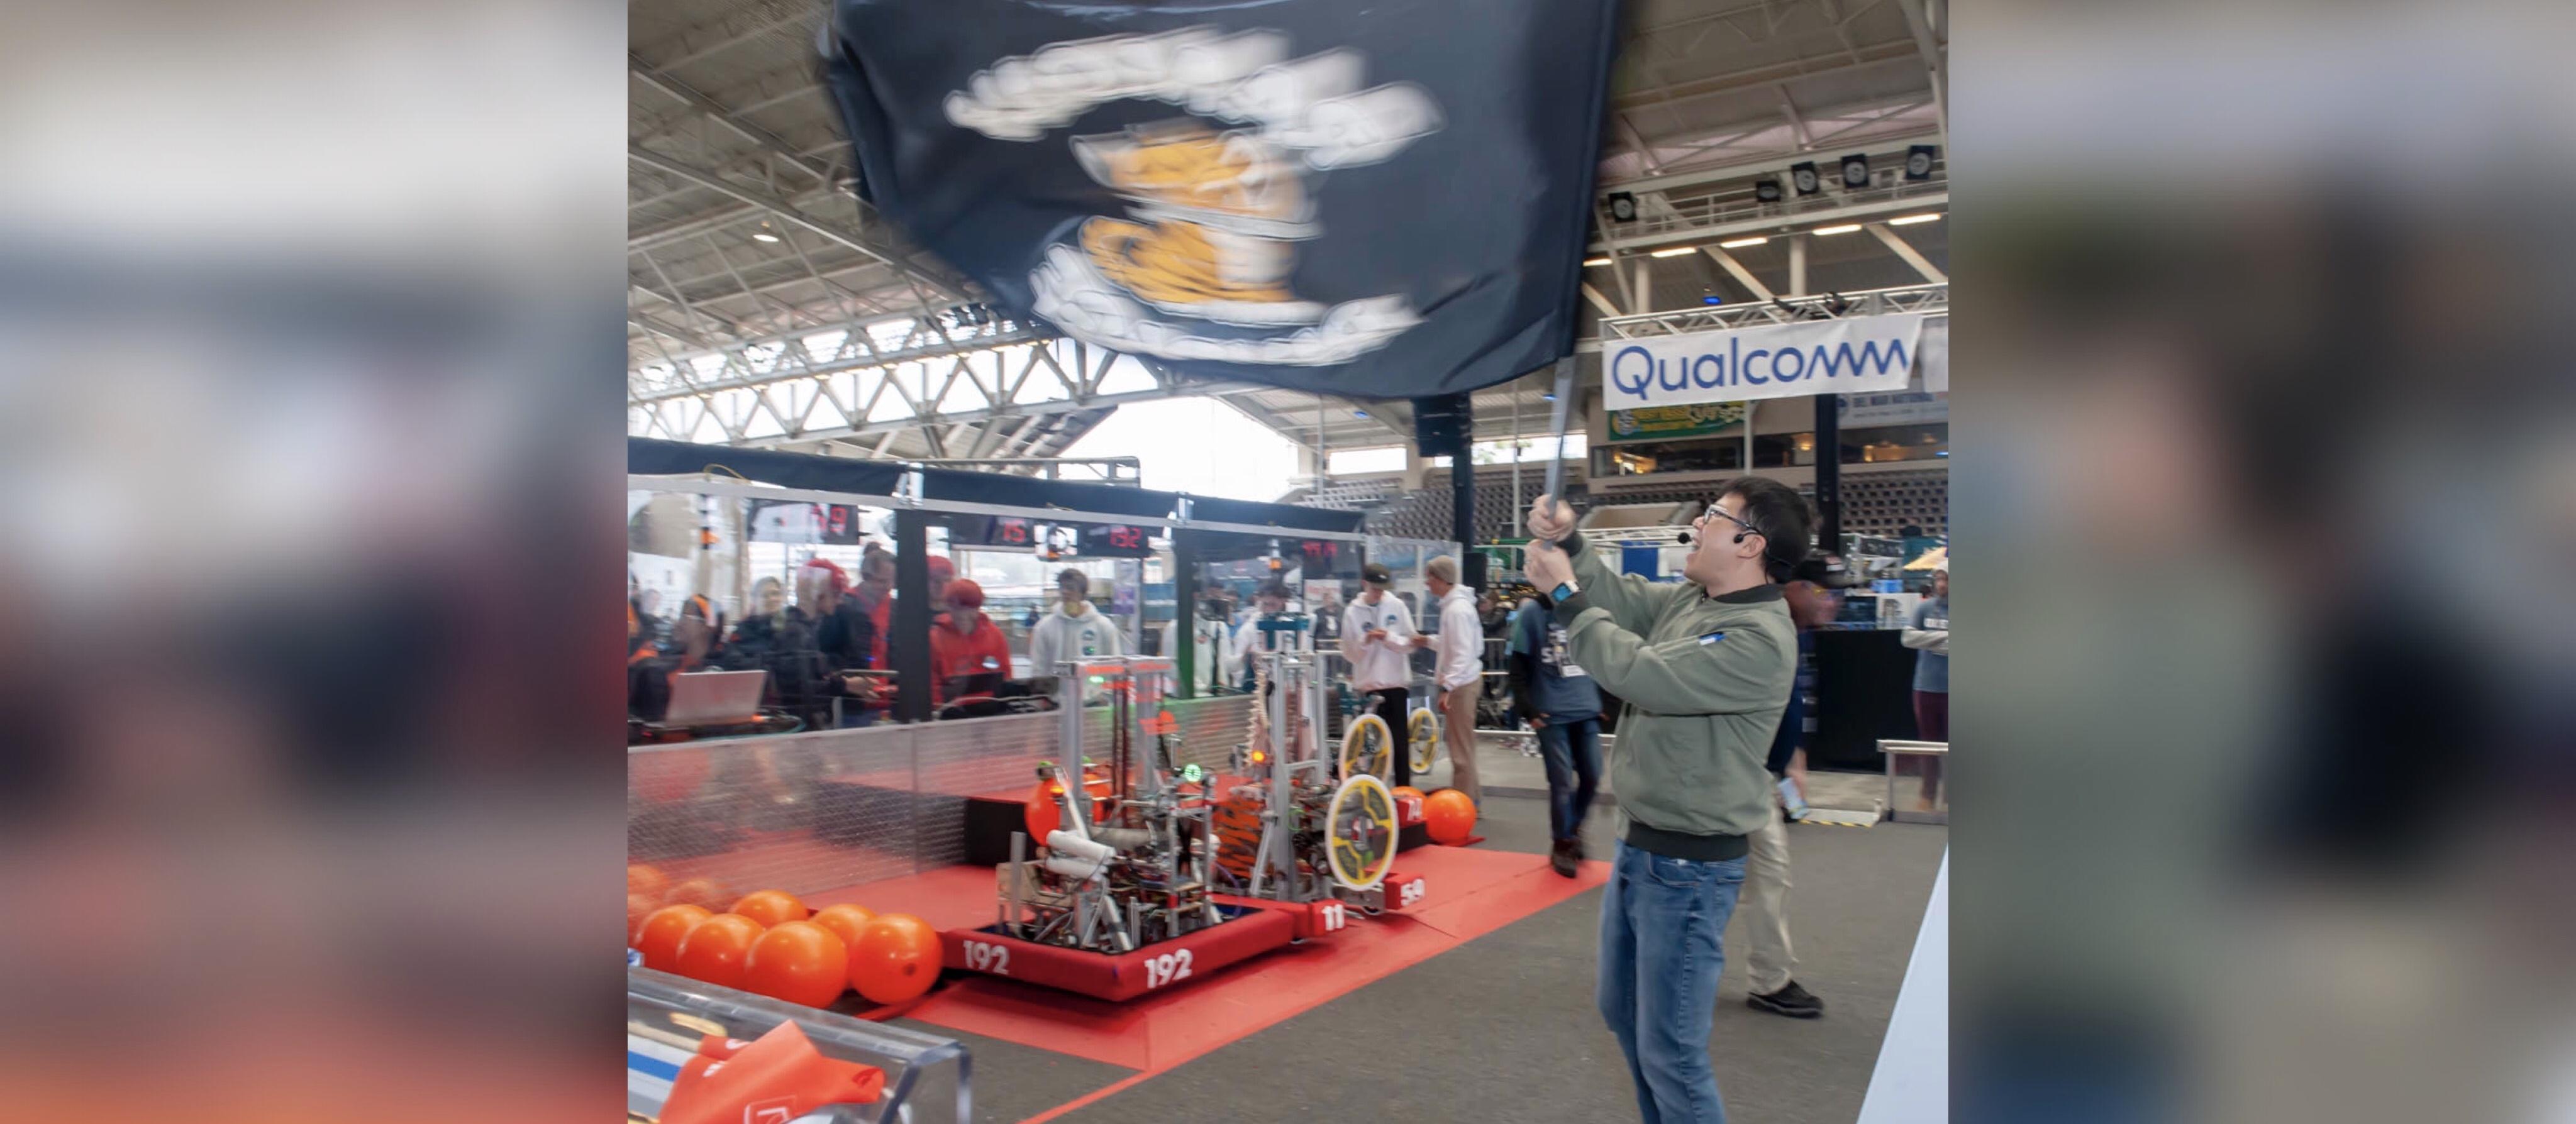 13th Annual San Diego FIRST Robotics Regional presented by Qualcomm – 2019